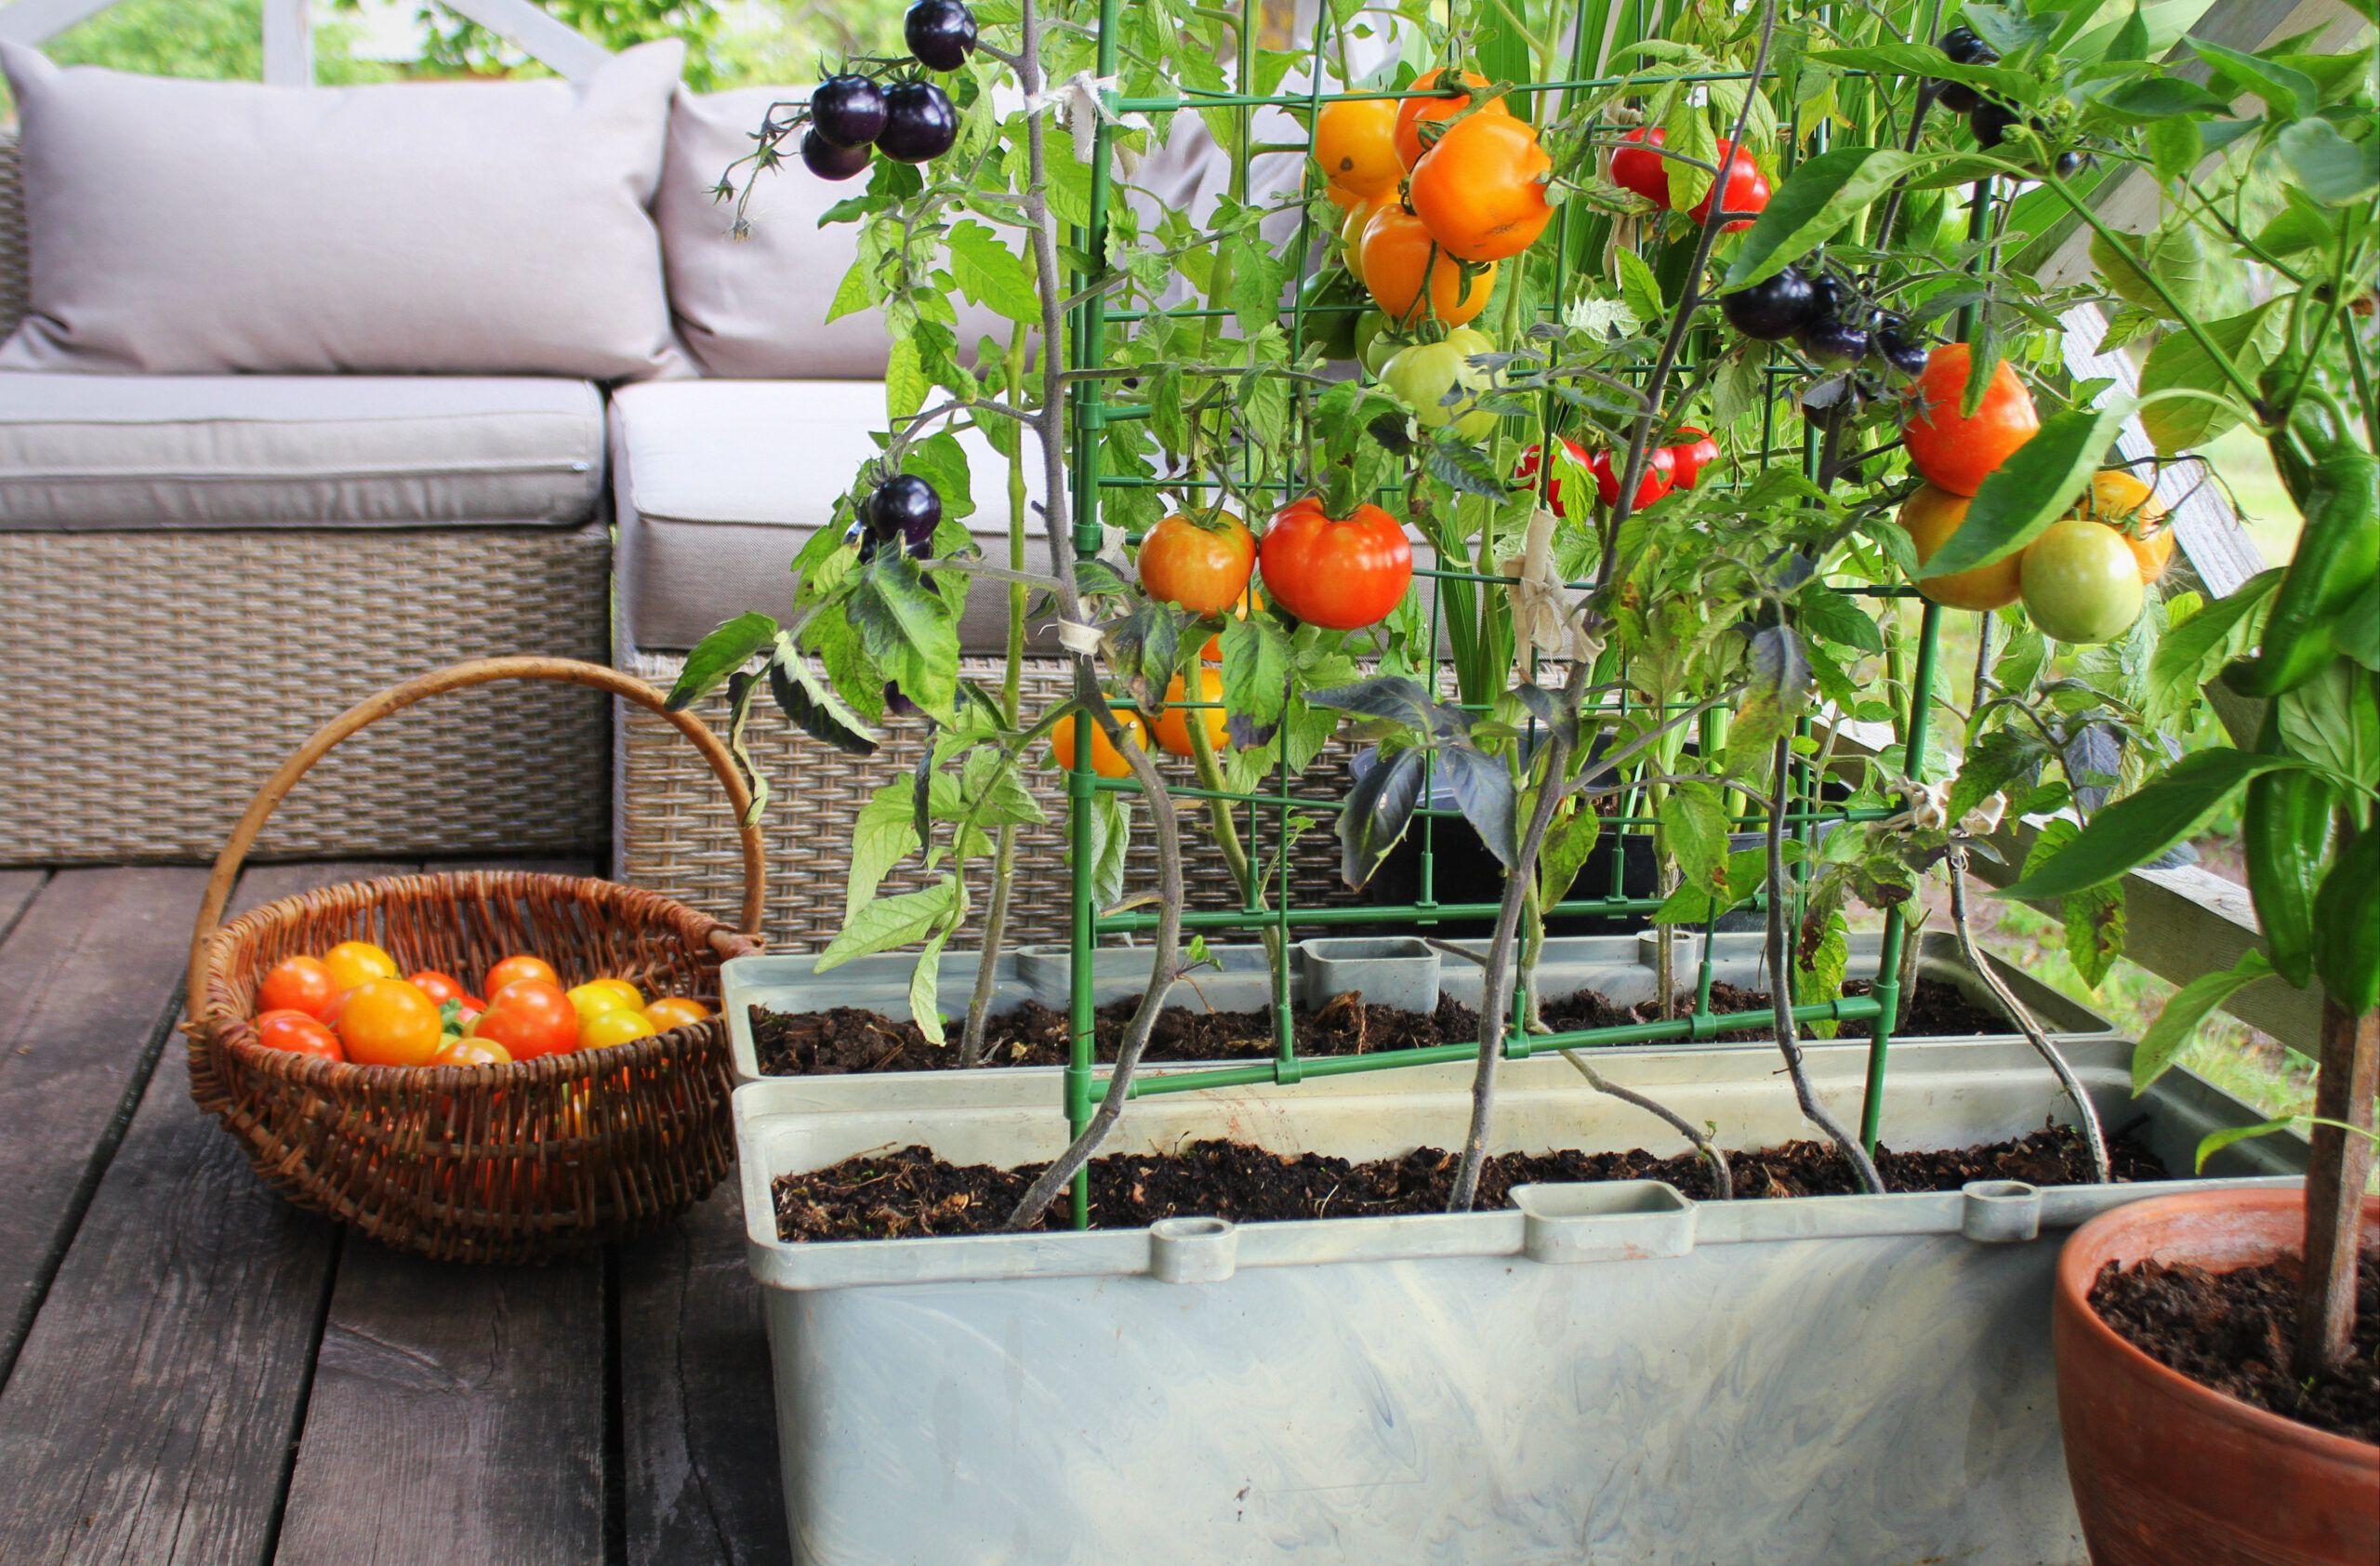 balcony vegetable garden-tomato plants